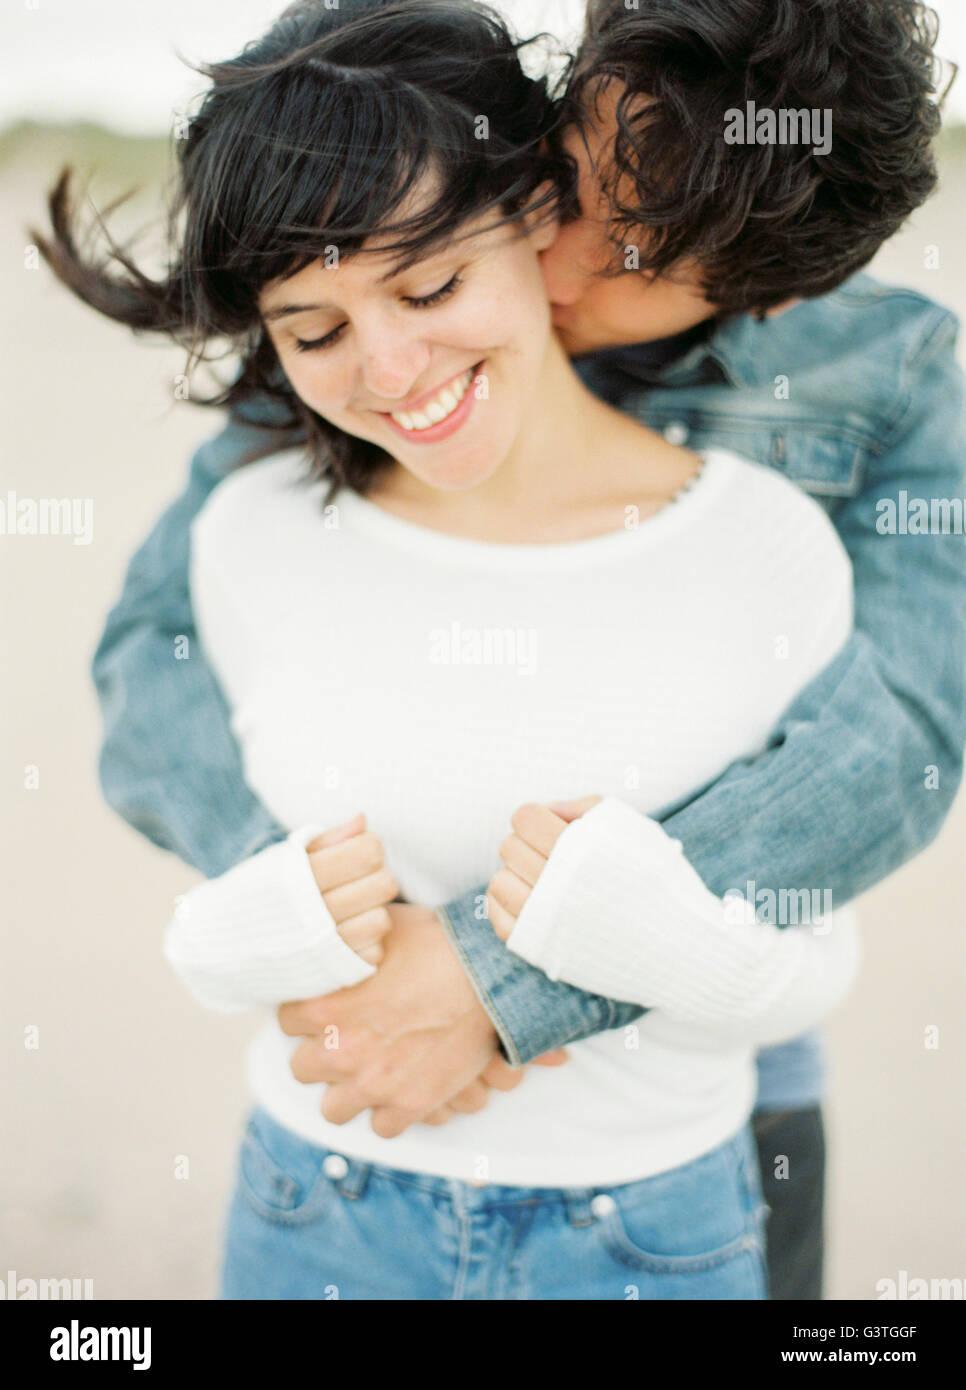 L'espagne, Valence, Man embracing et baisers petite amie Photo Stock